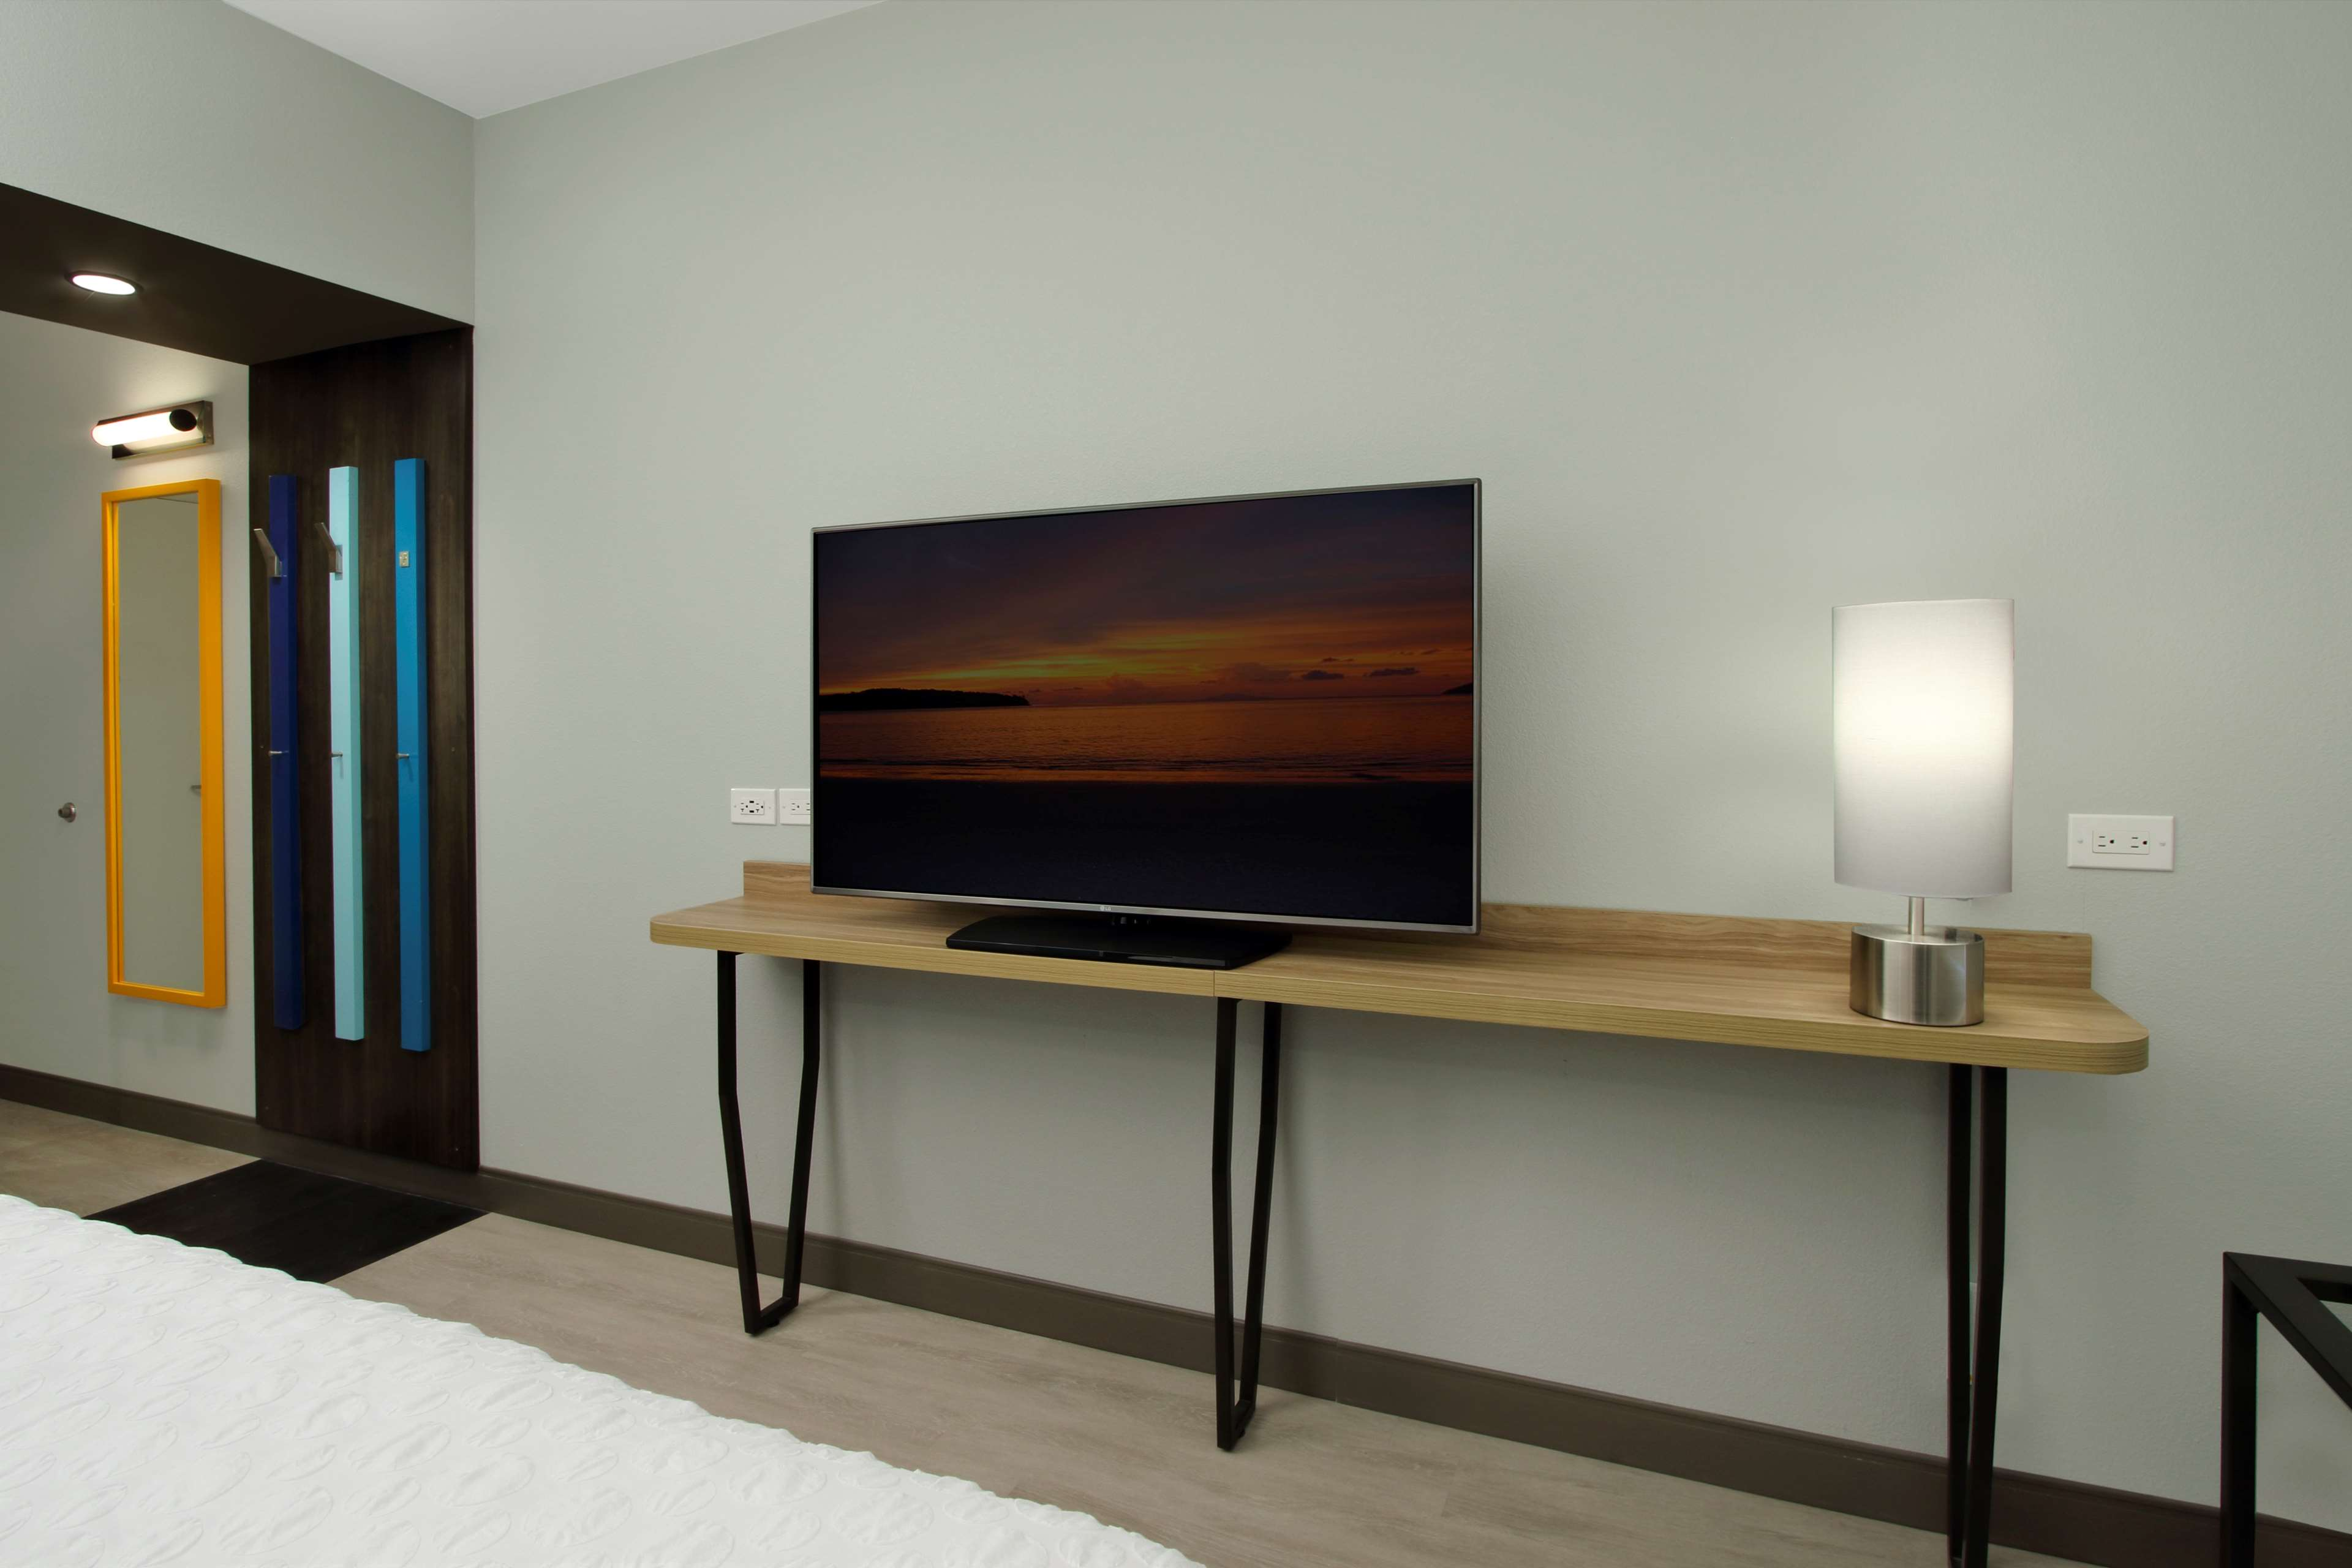 Tru by Hilton Meridian image 25